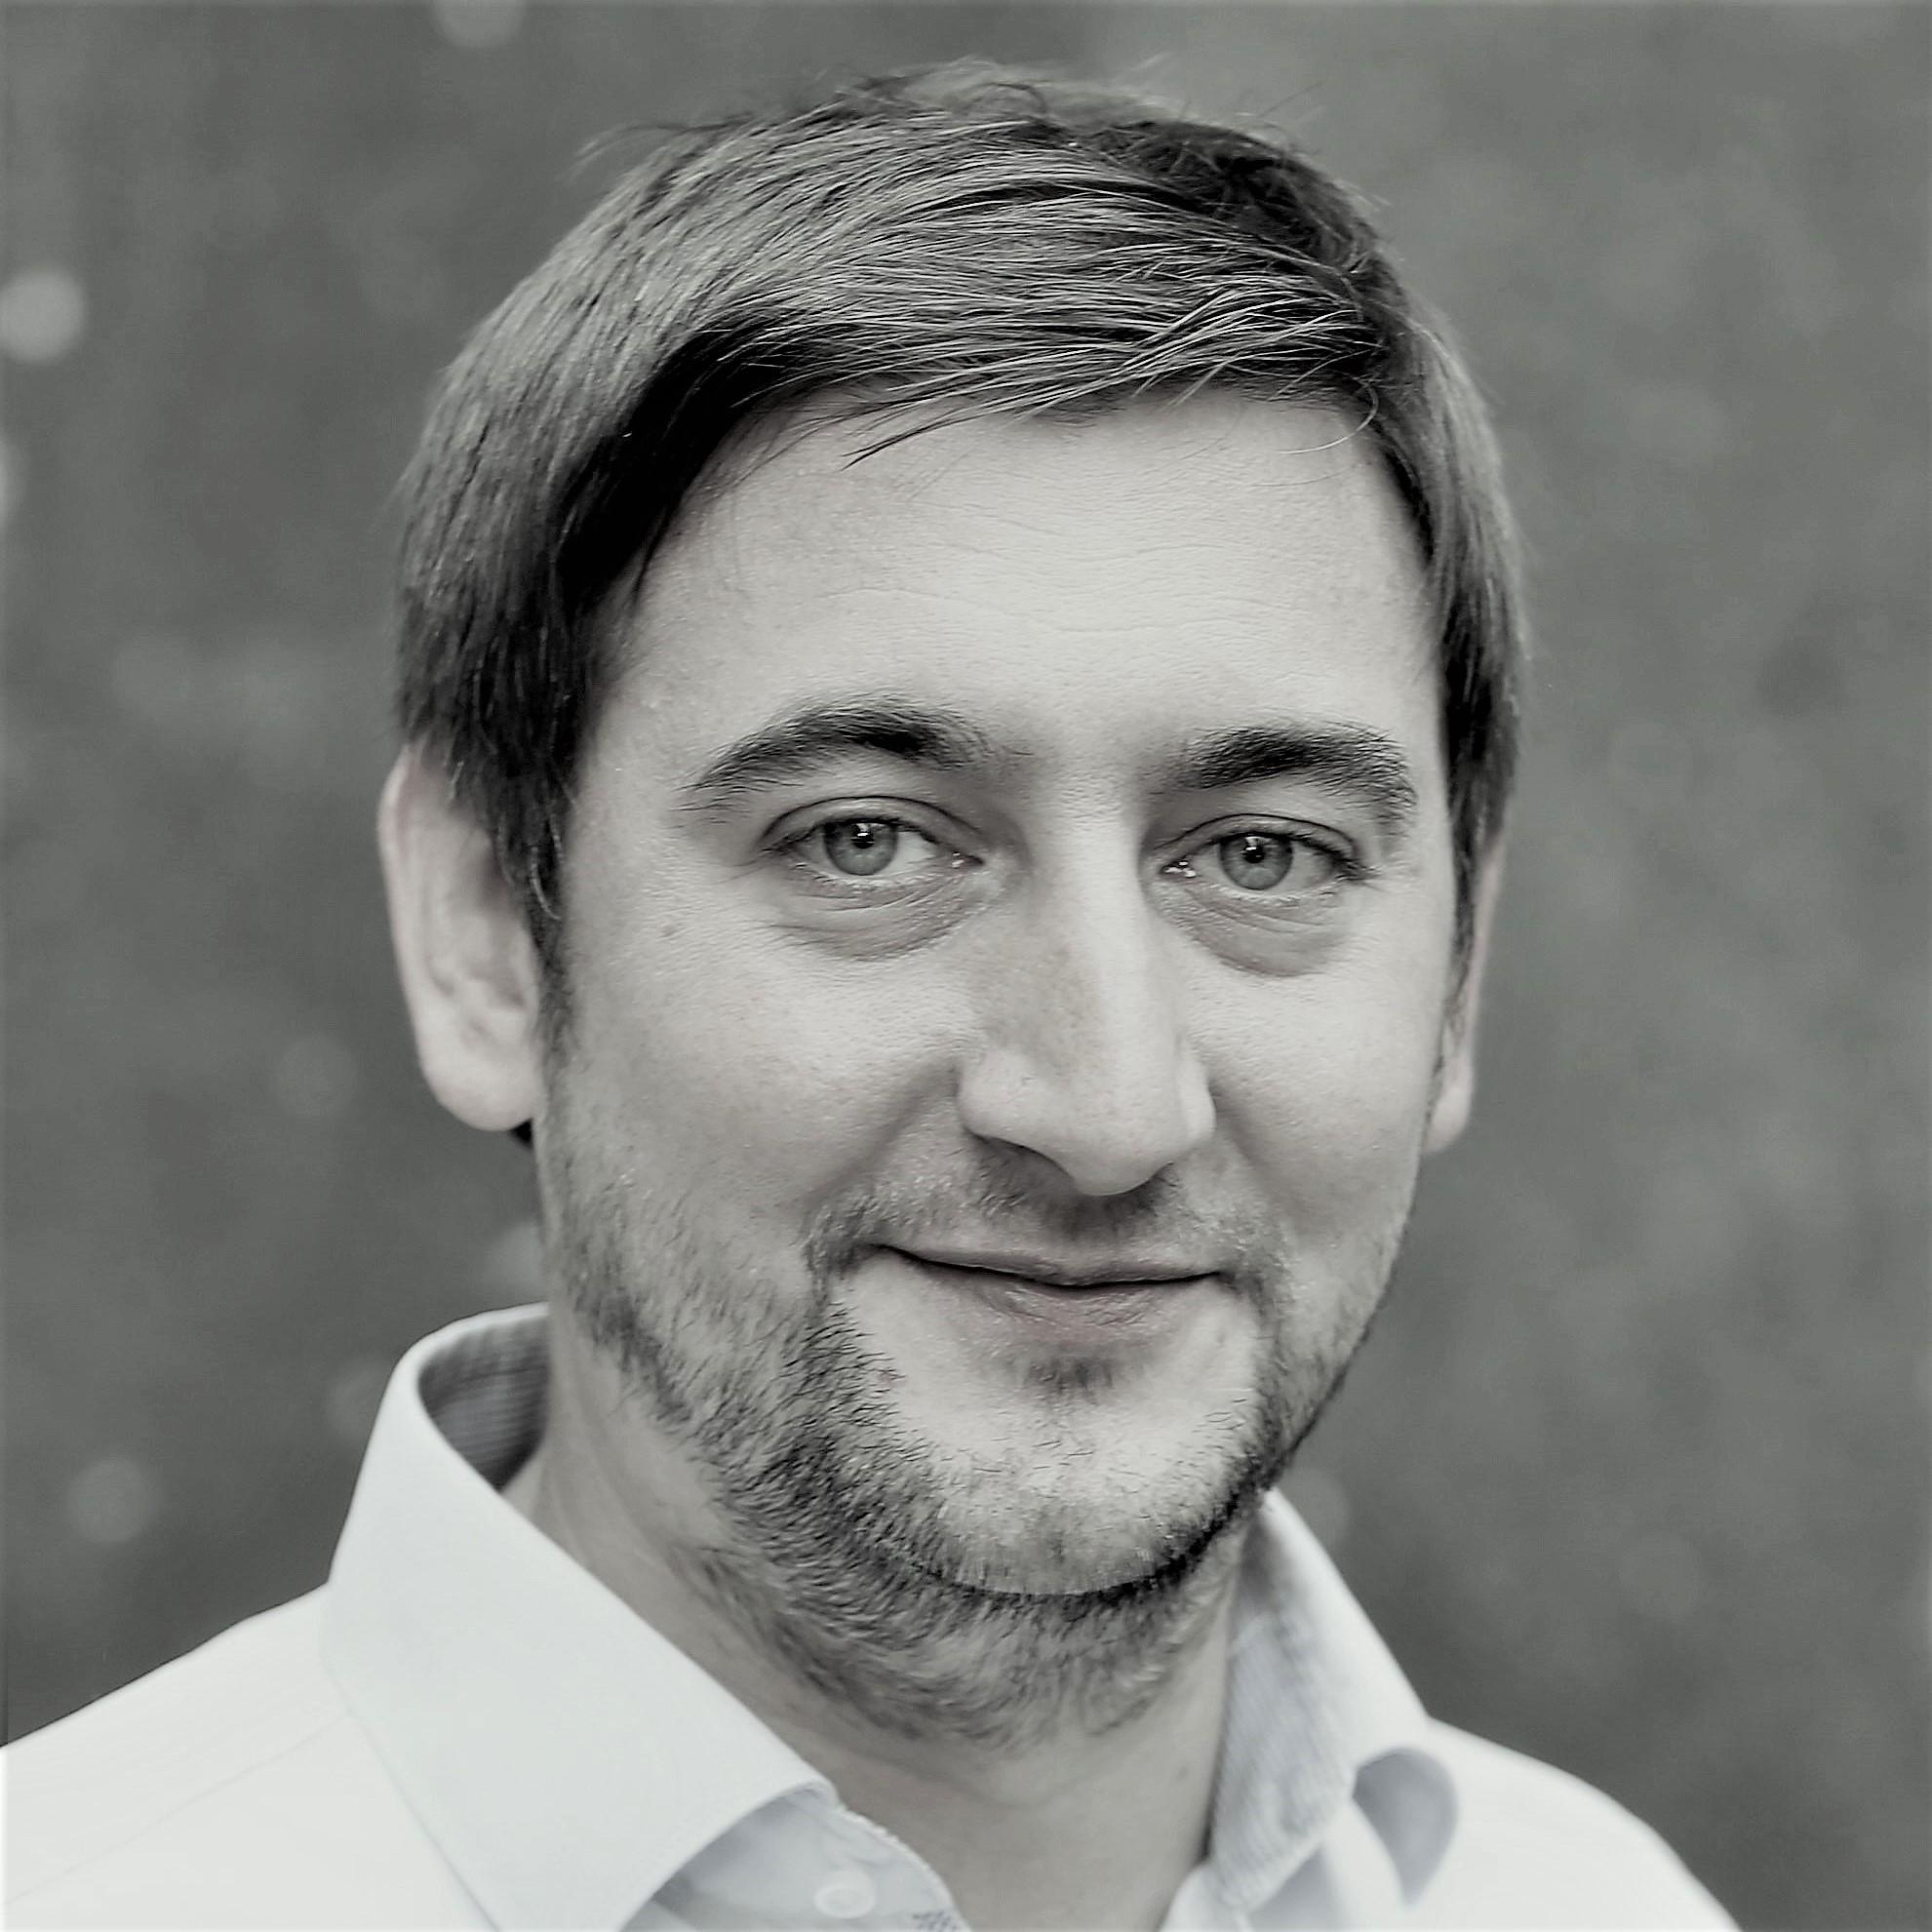 Markus Zingel